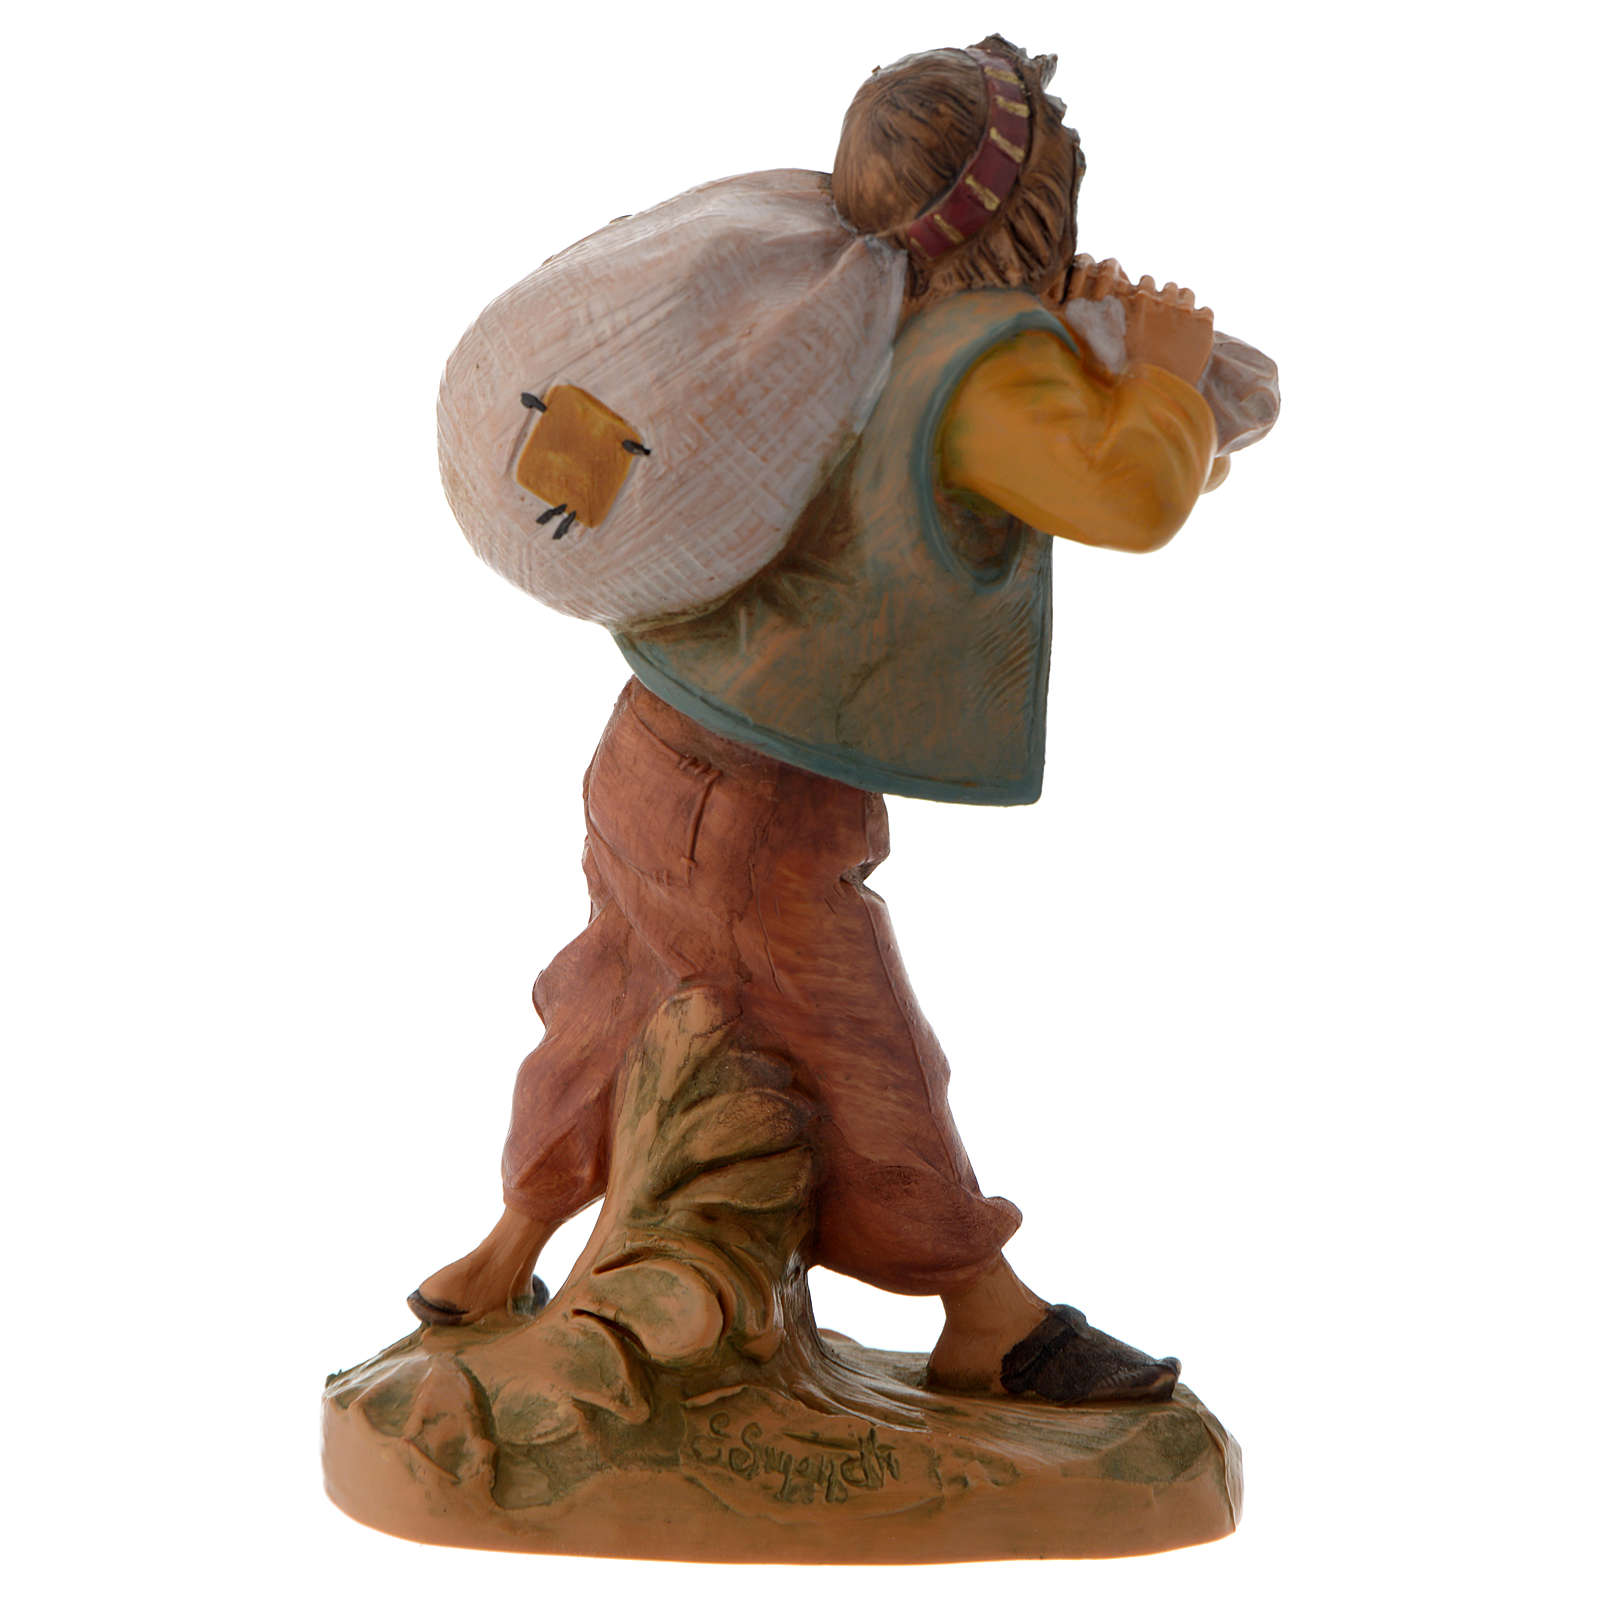 Garçon et son sac crèche Fontanini 12 cm 4